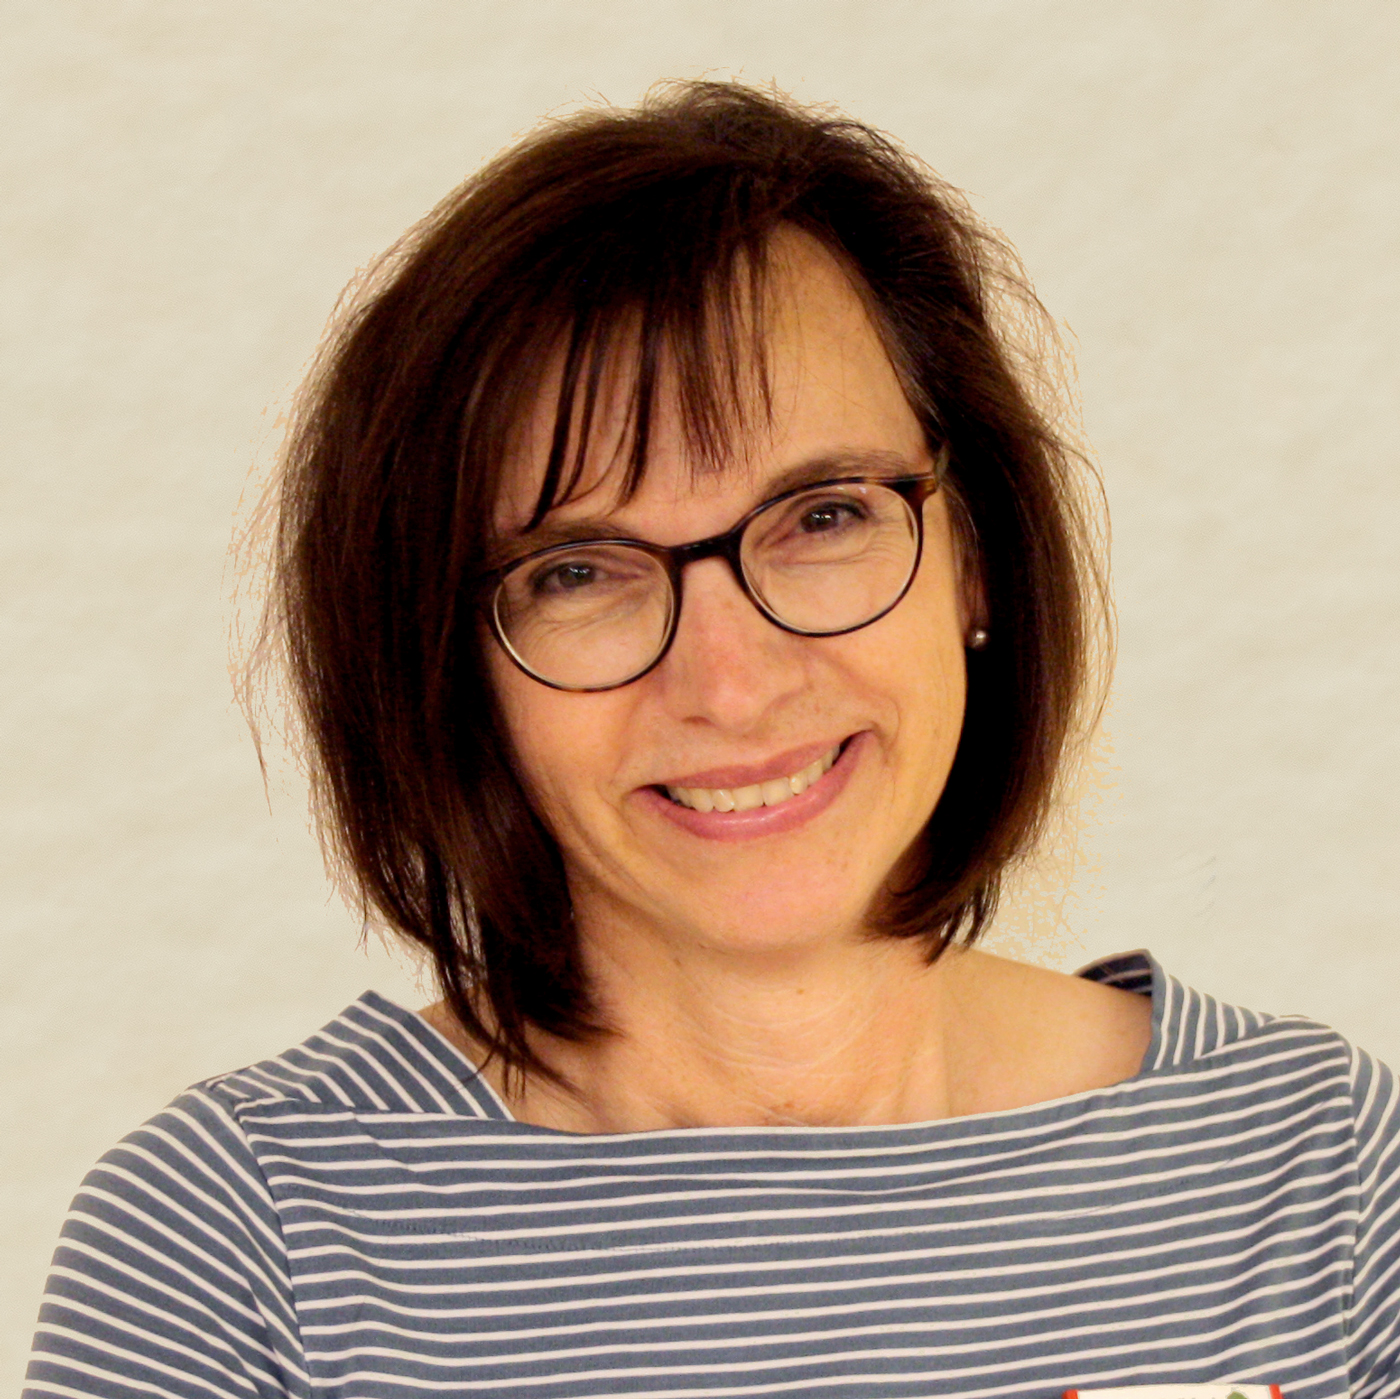 Sabine Preus